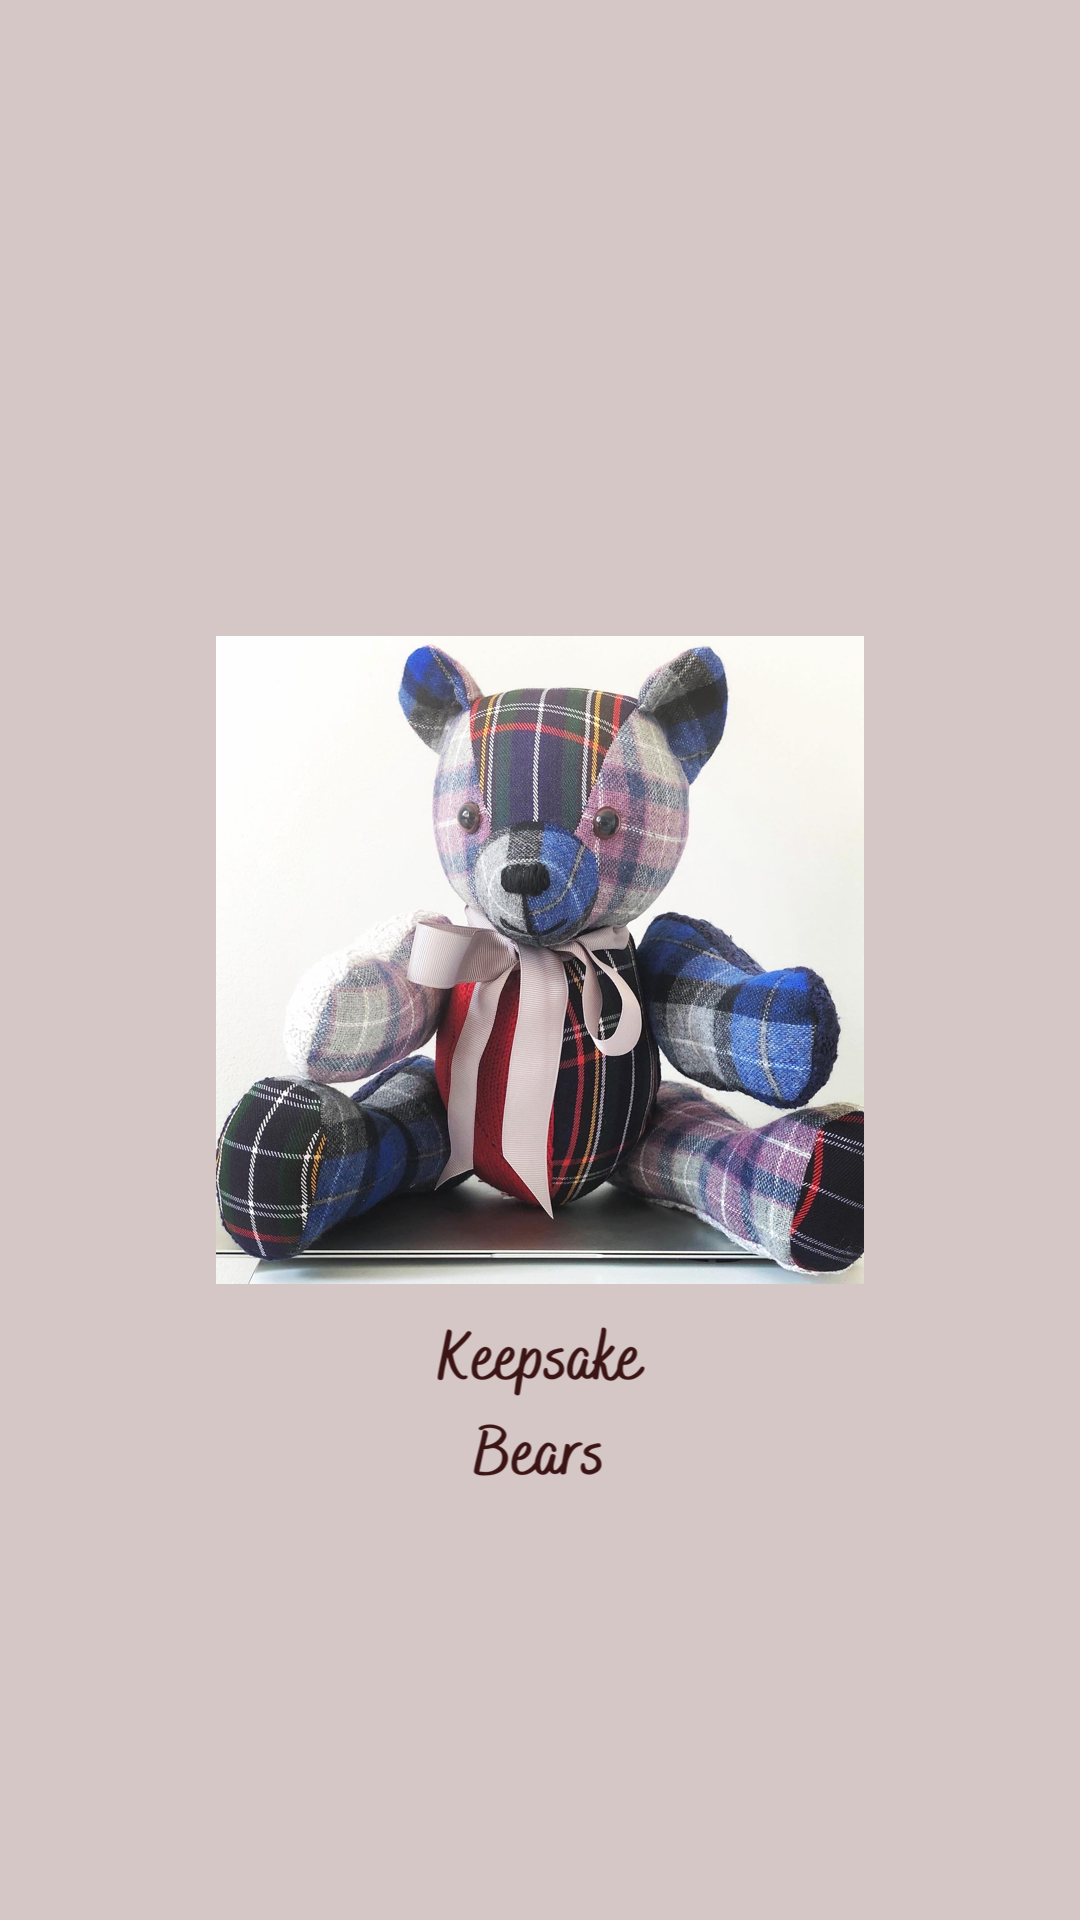 Keepsake Bears Suffolk